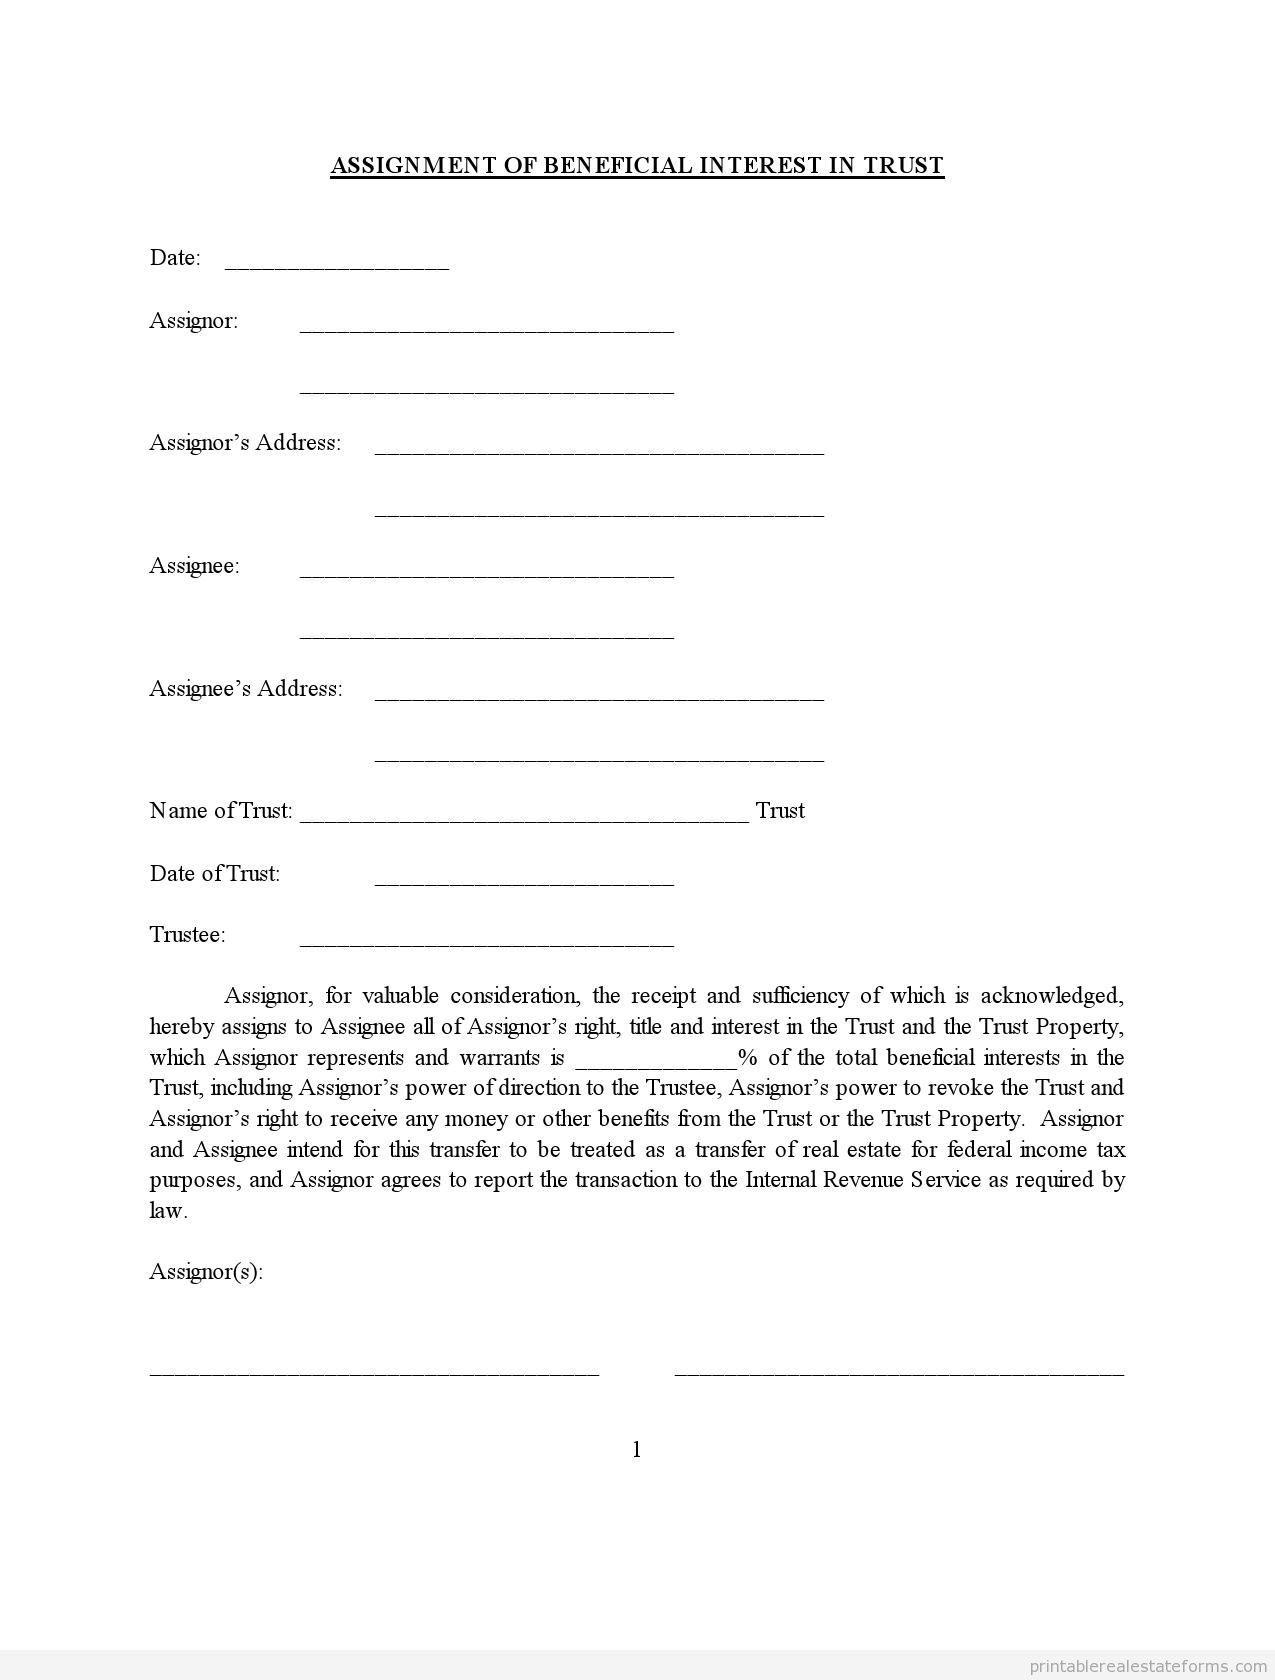 Printable Trustassignment Of Benificial Interest Template